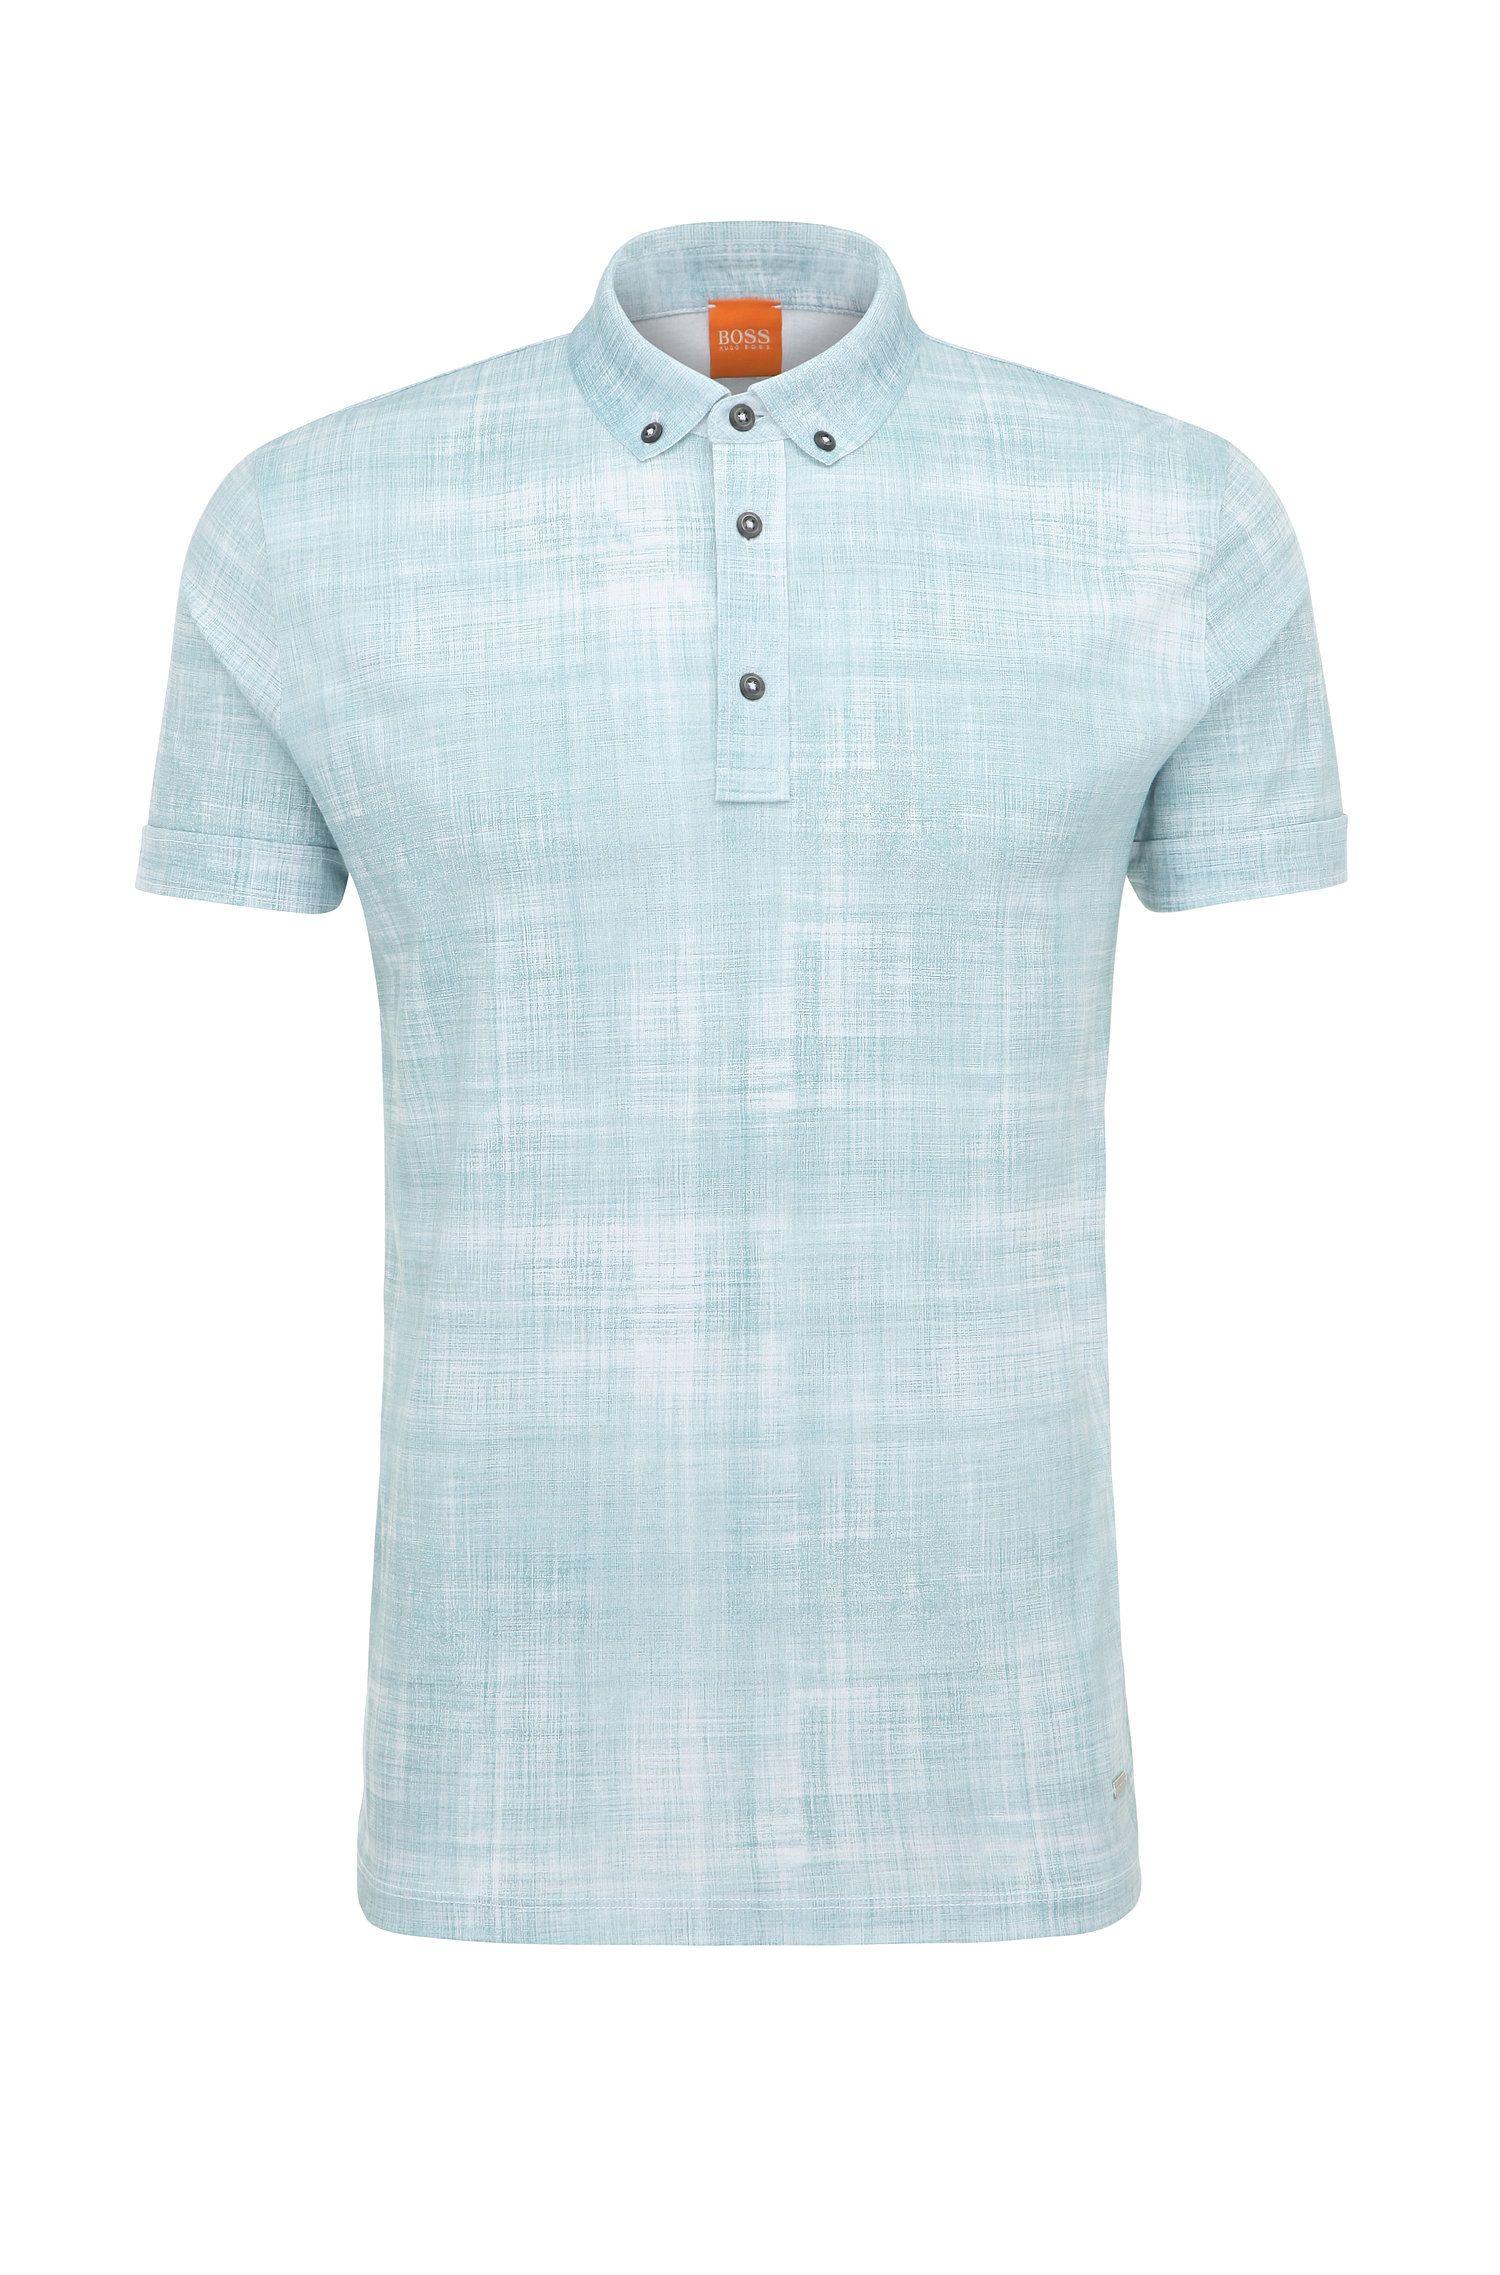 'Porcher' | Slim Fit, Cotton Printed Polo Shirt